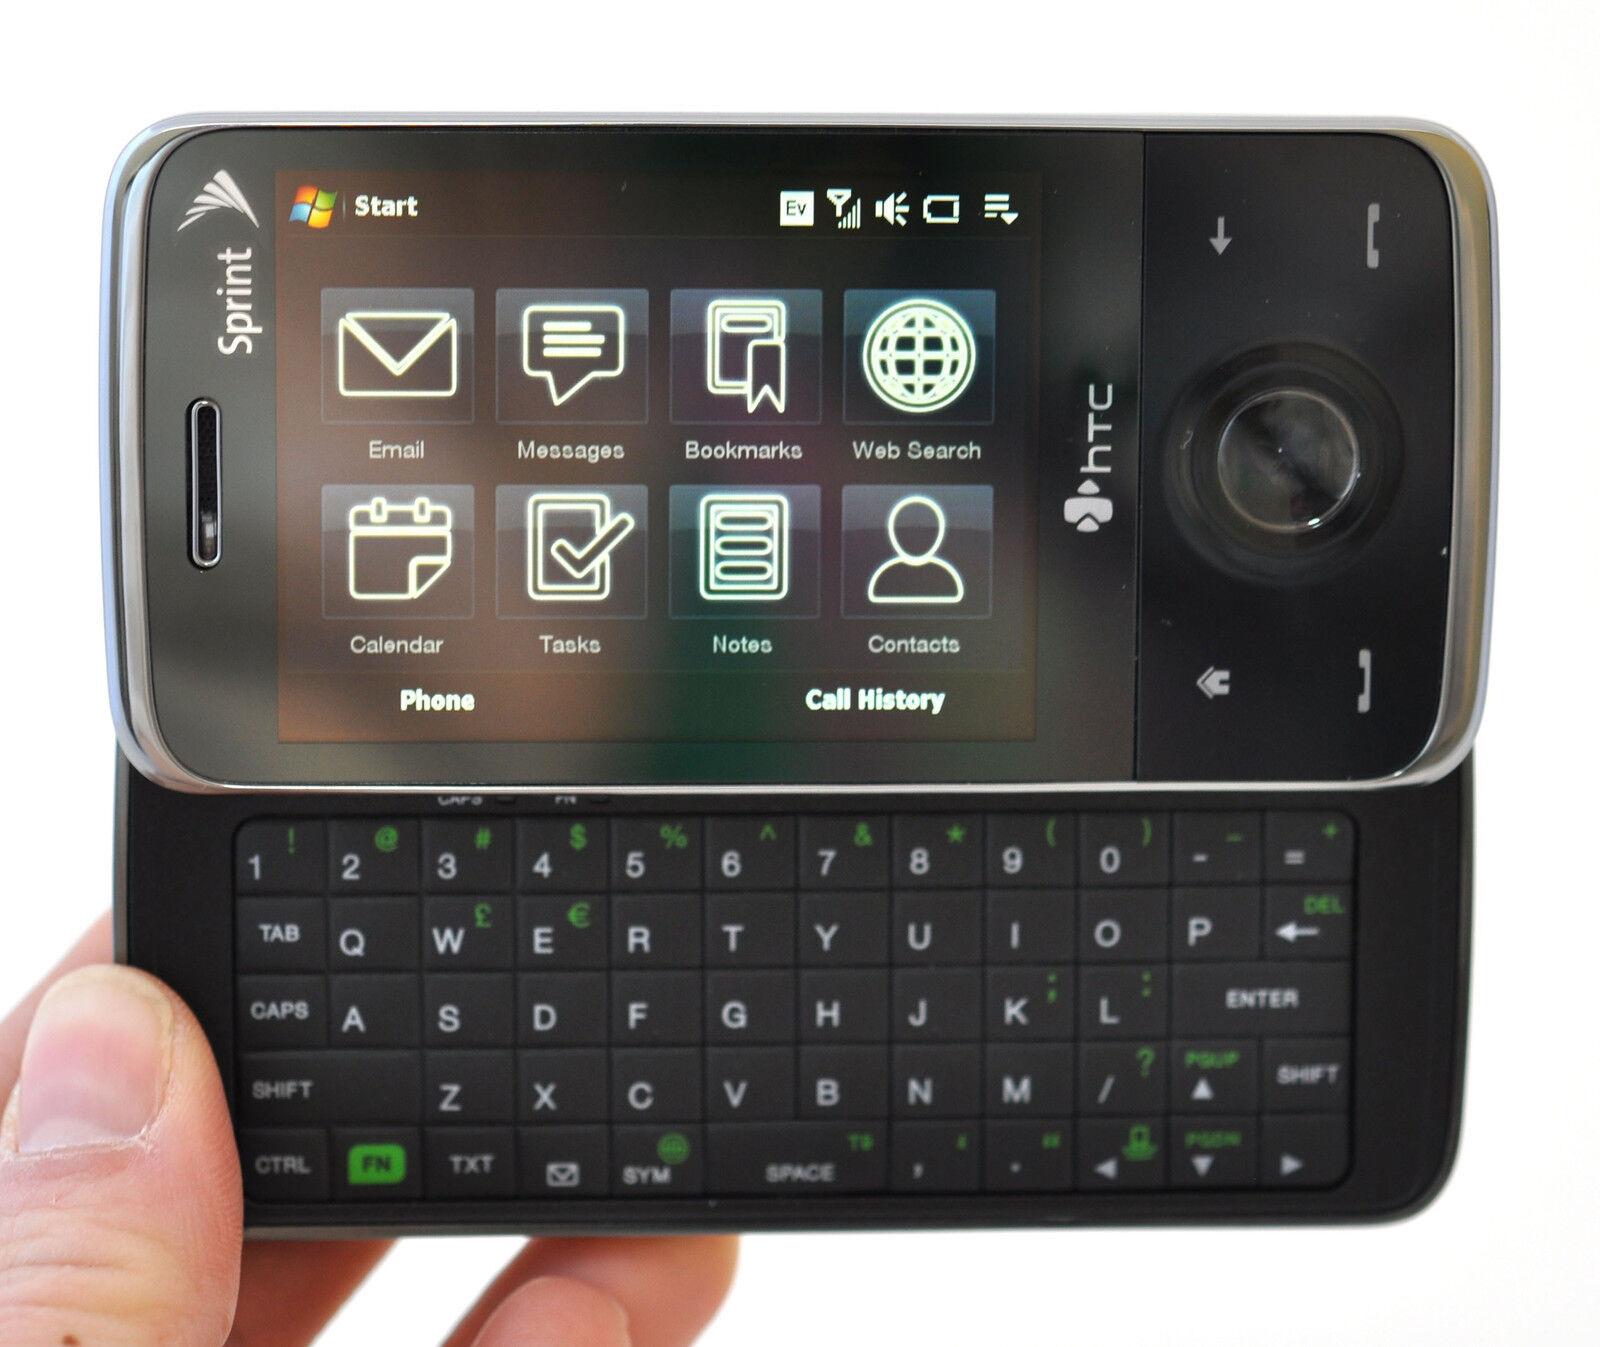 htc touch pro sprint windows cell phone ppc6850 6850 screen nfl rh ebay com Sprint HTC Innovation Sprint HTC EVO 4G LTE